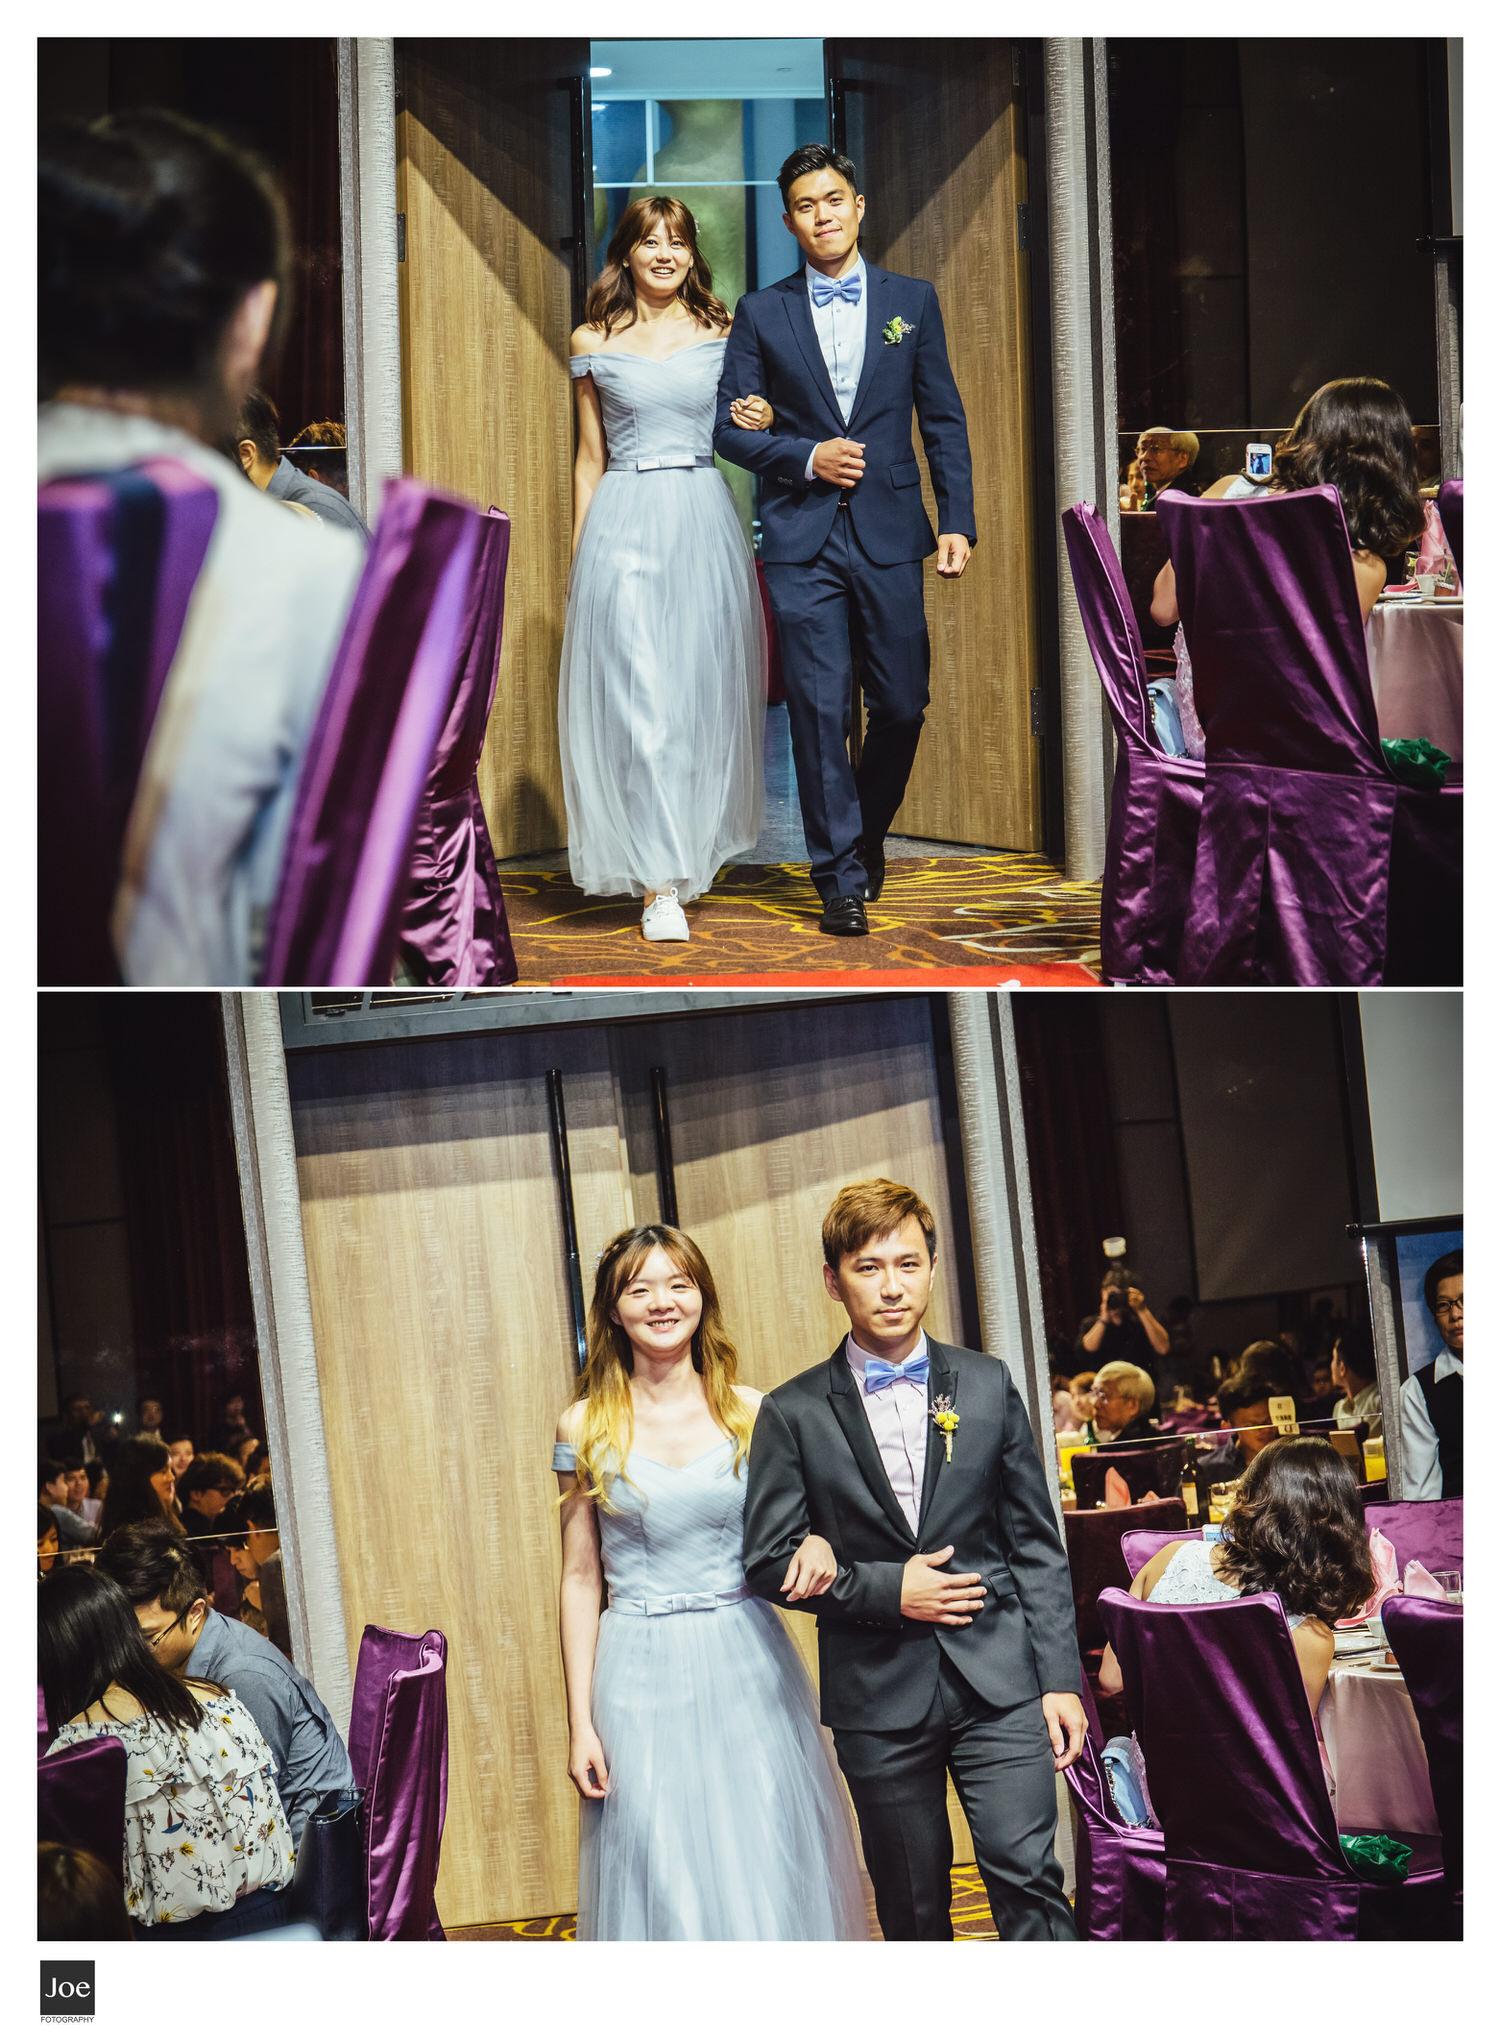 jc-olivia-wedding-87-liyan-banquet-hall-joe-fotography.jpg